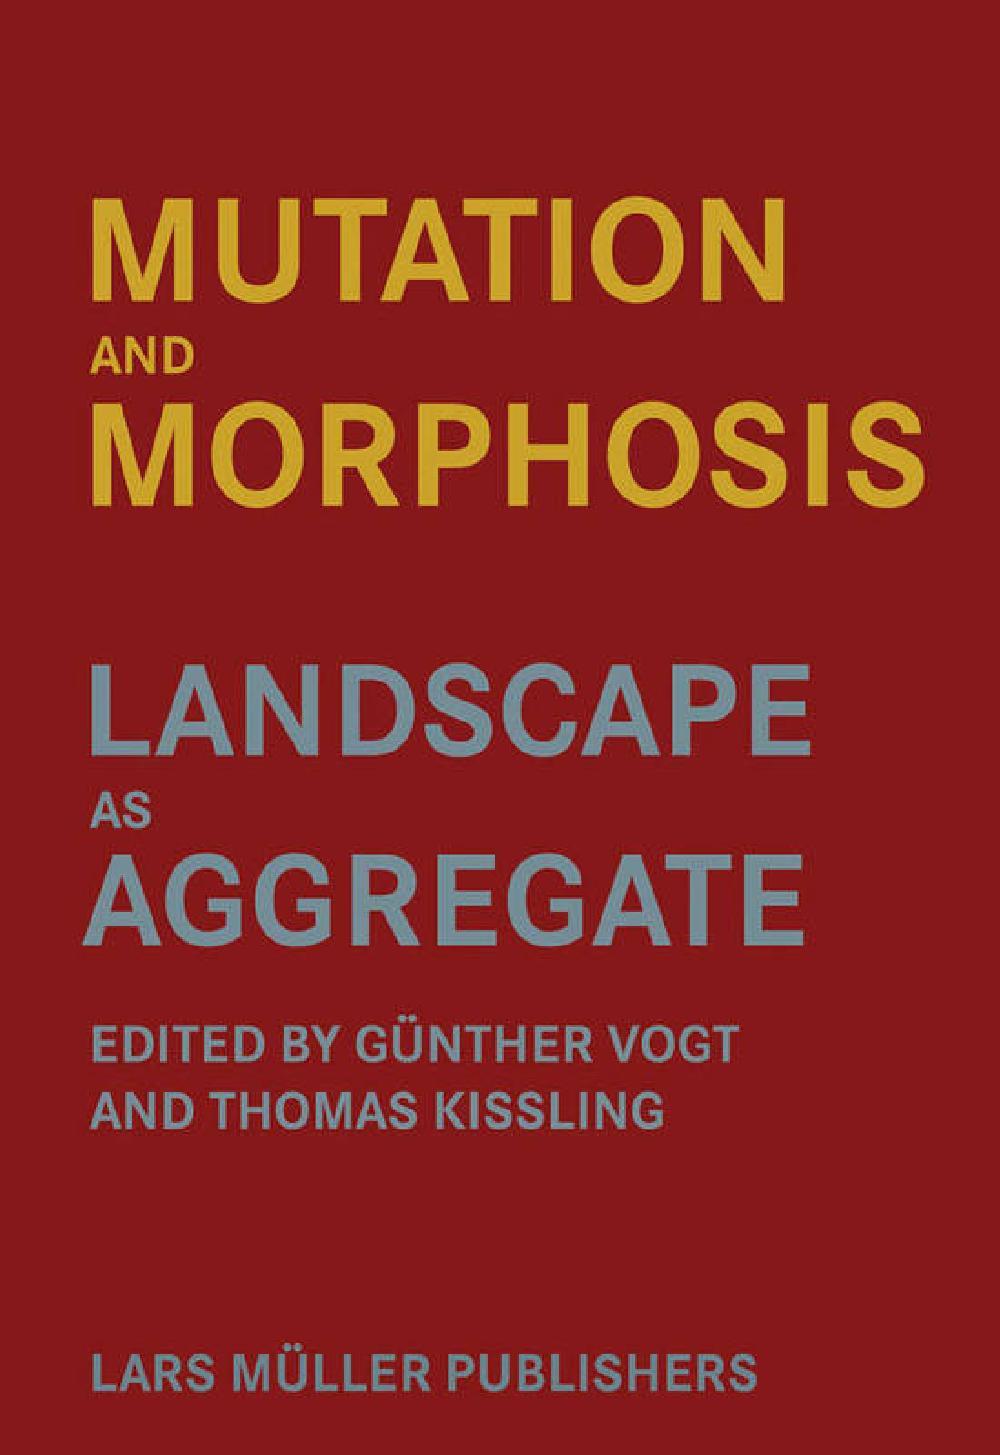 Mutation and morphosis - Landscape as aggregate